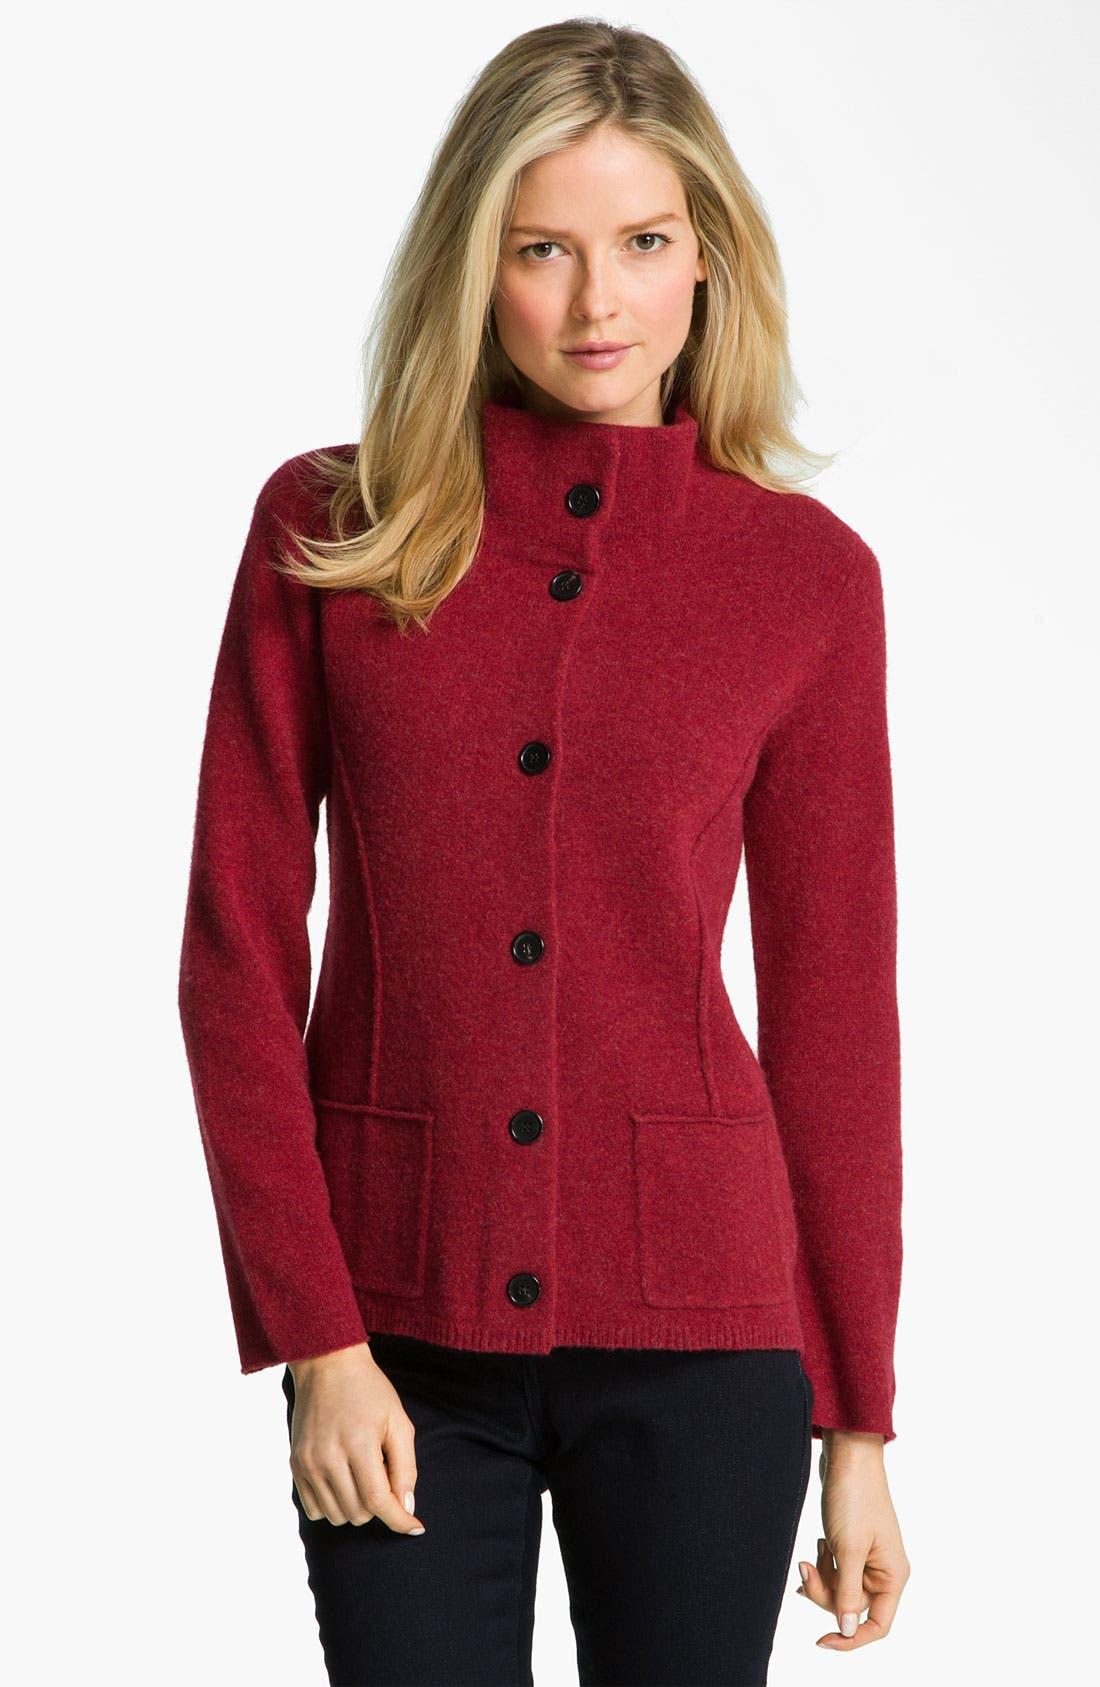 Alternate Image 1 Selected - Eileen Fisher Felted Merino Lambswool Jacket (Petite)